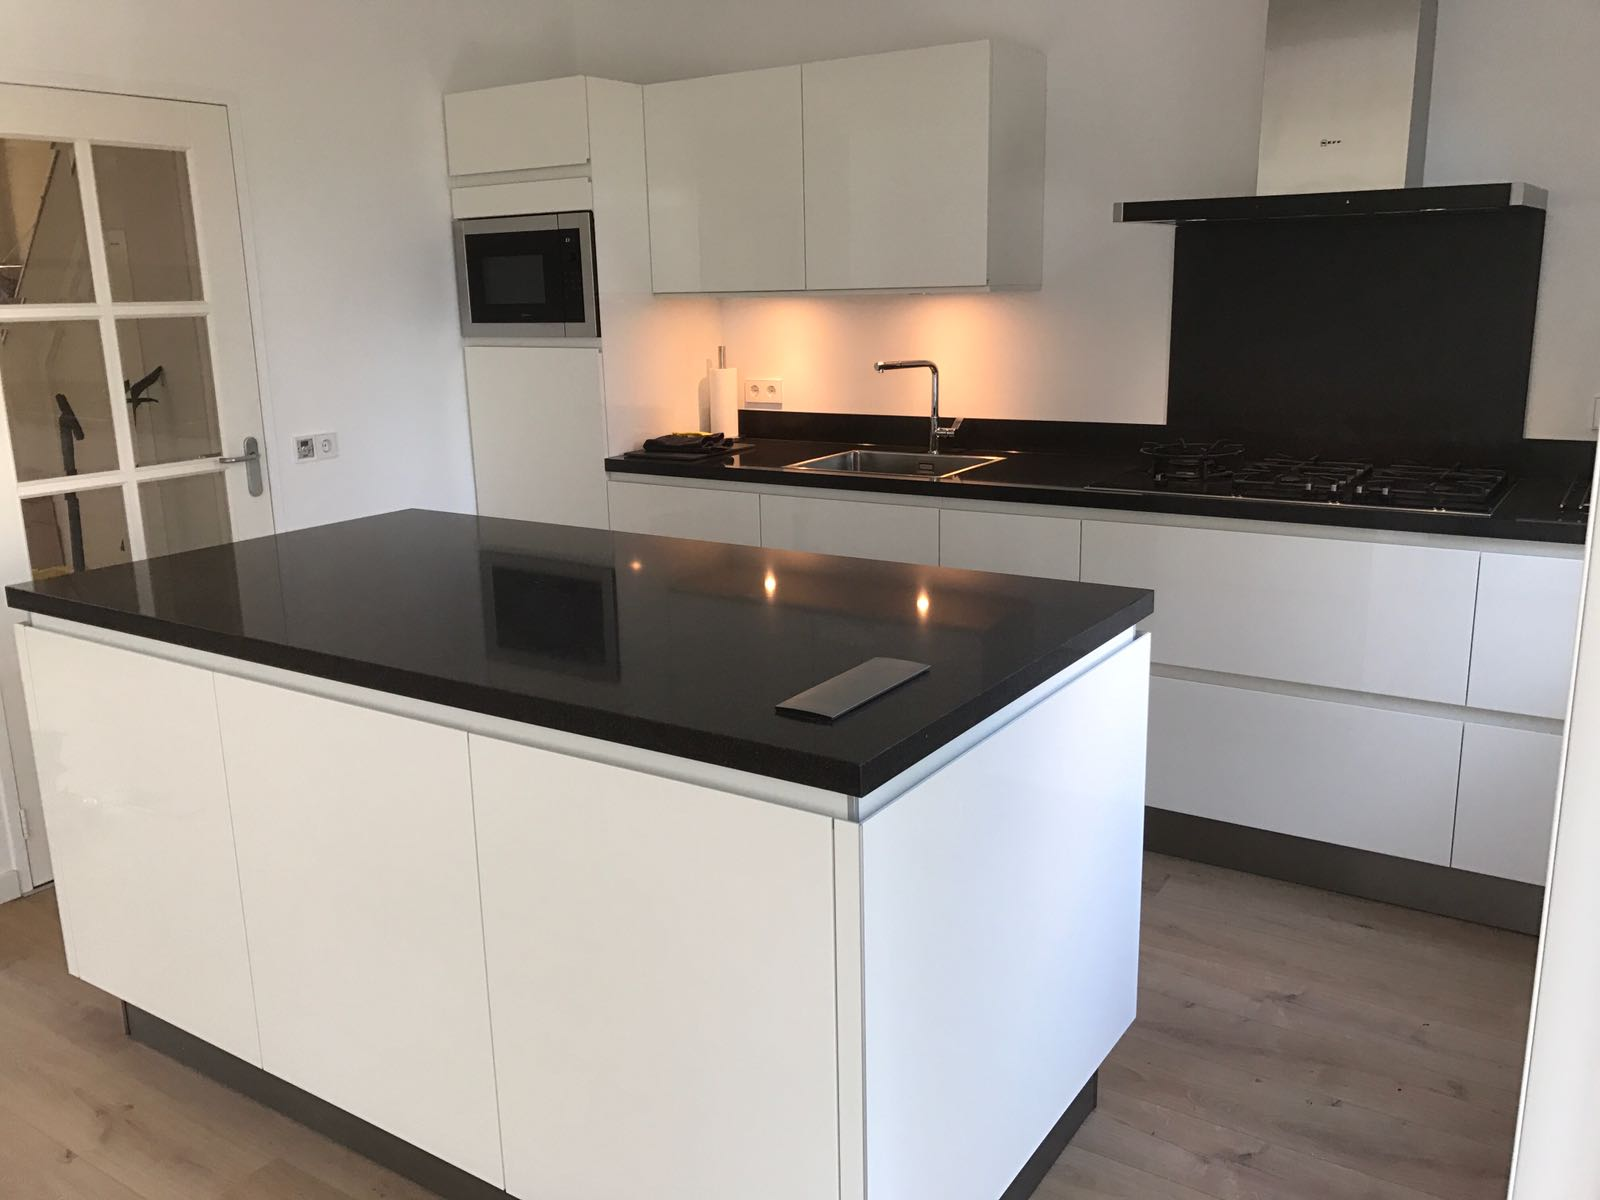 Hoogglans Wit Keuken : Greeploos hoogglans wit gelakte keuken your new kitchen